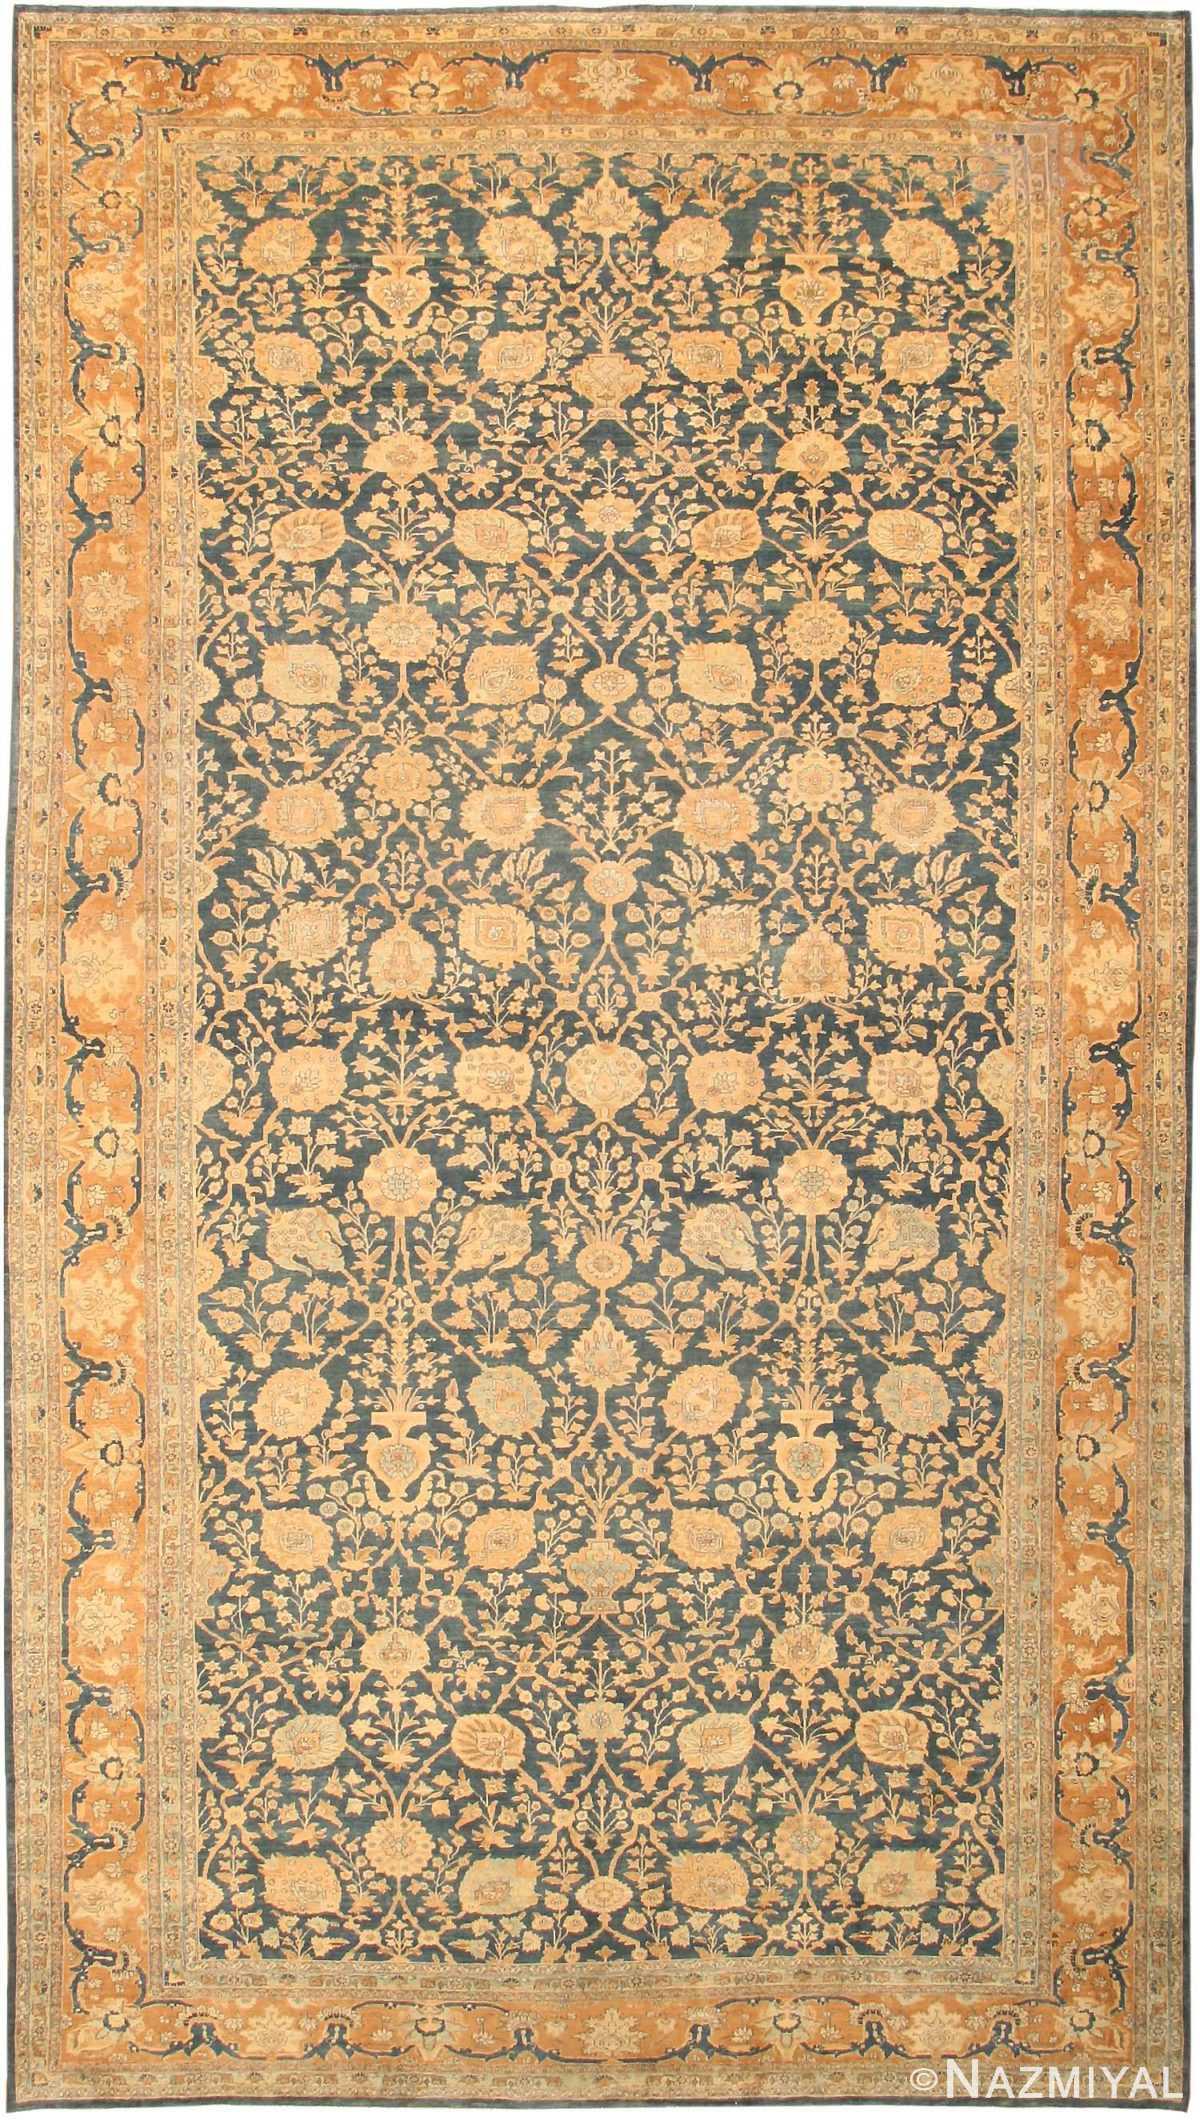 Large Antique Tabriz Persian Rug 43098 by Nazmiyal